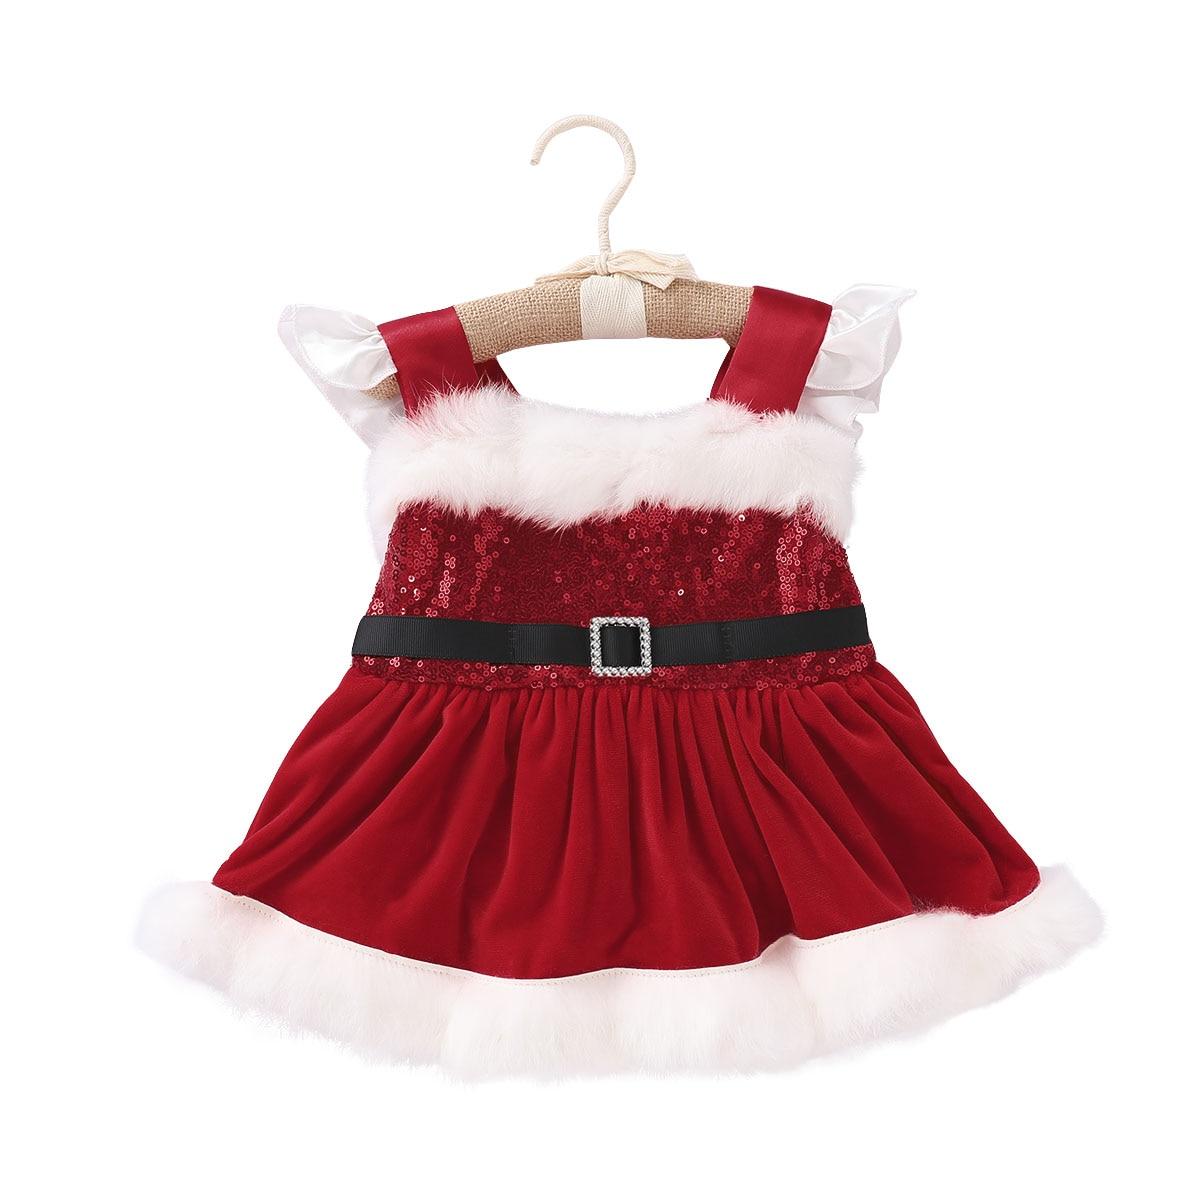 2018 New Christmas Newborn Baby Girl Velvet Romper Sequin Sleeveless Red Romper Jumpsuit Playsuit Xmas Baby Girl Clothes DNFS